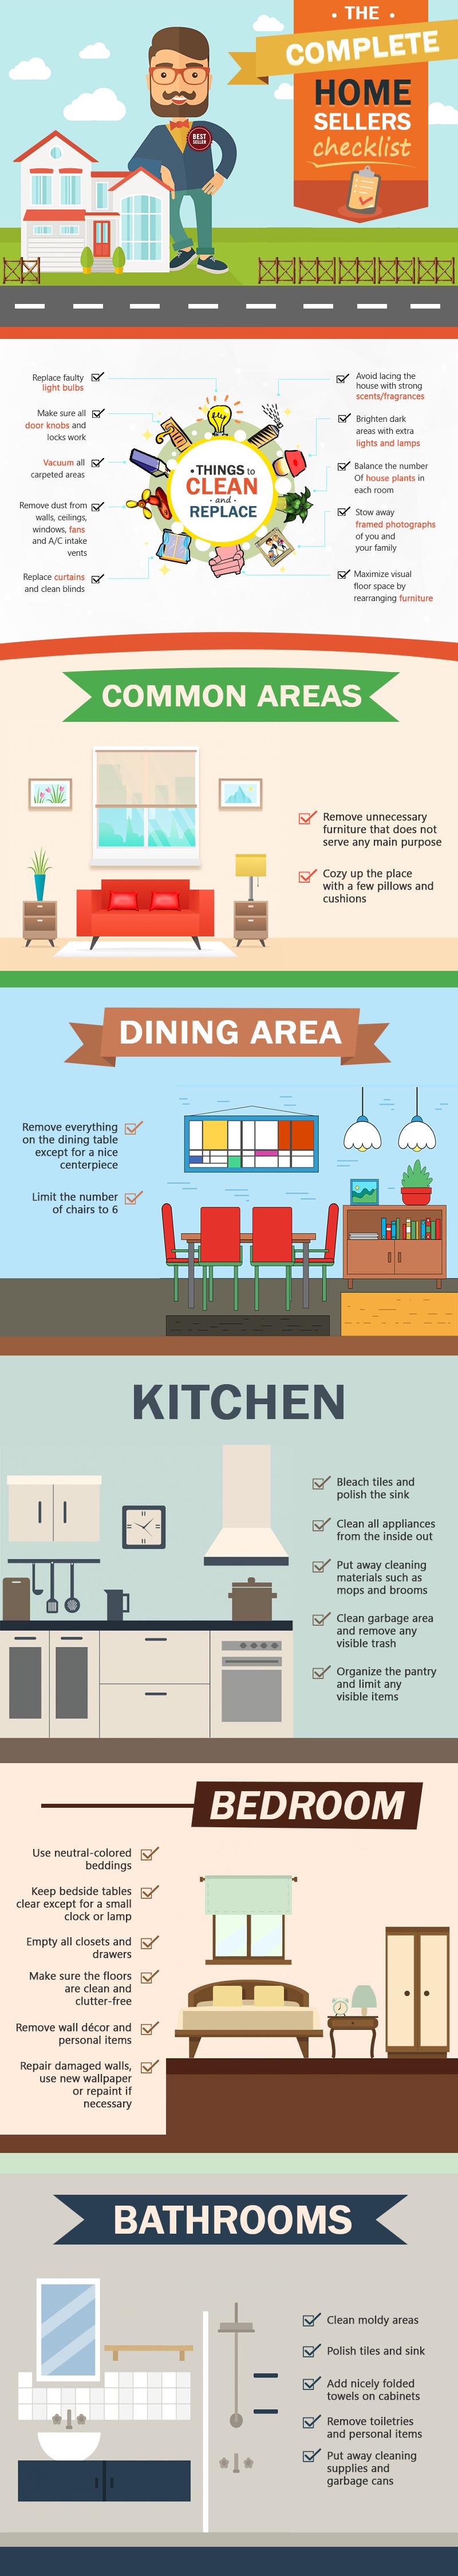 The Complete Home Sellers Checklist (Interior Preparation)